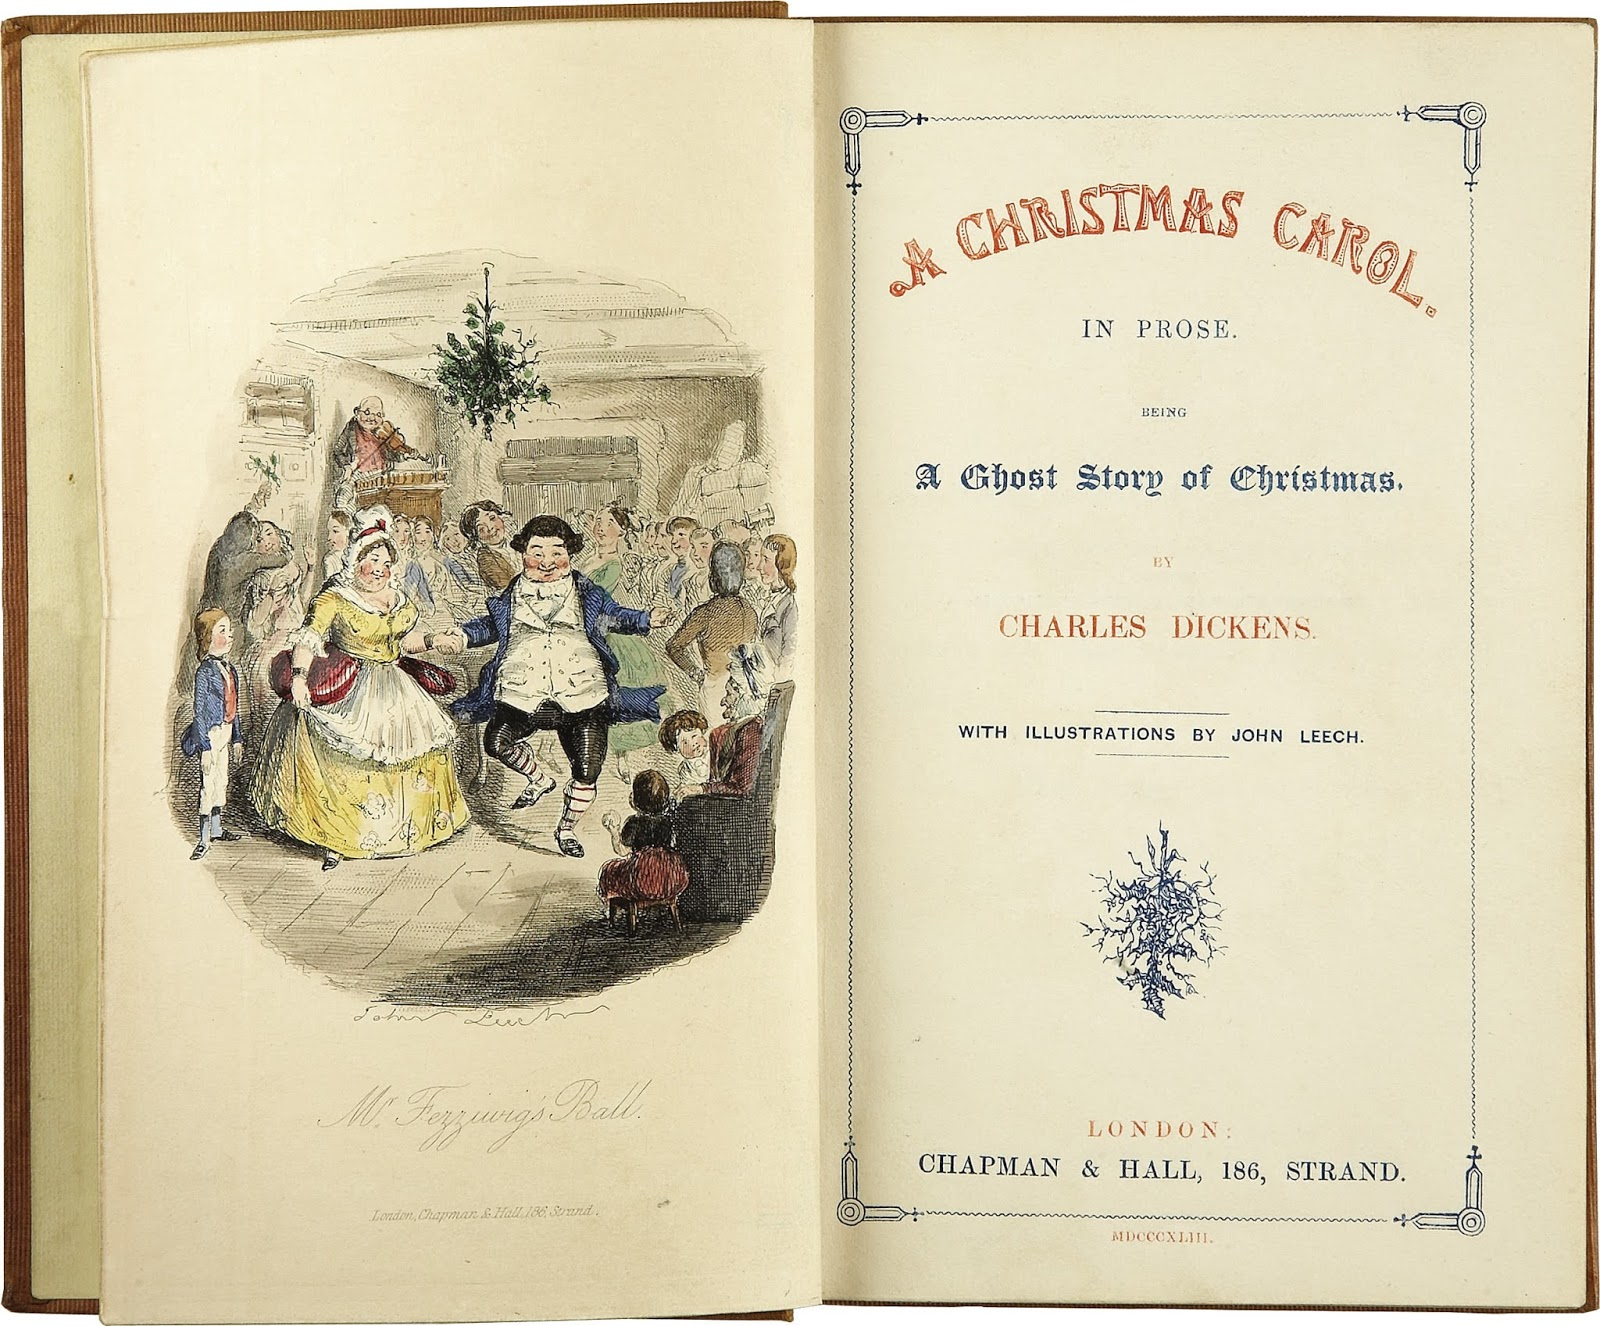 How did A Christmas Carol change the English language?